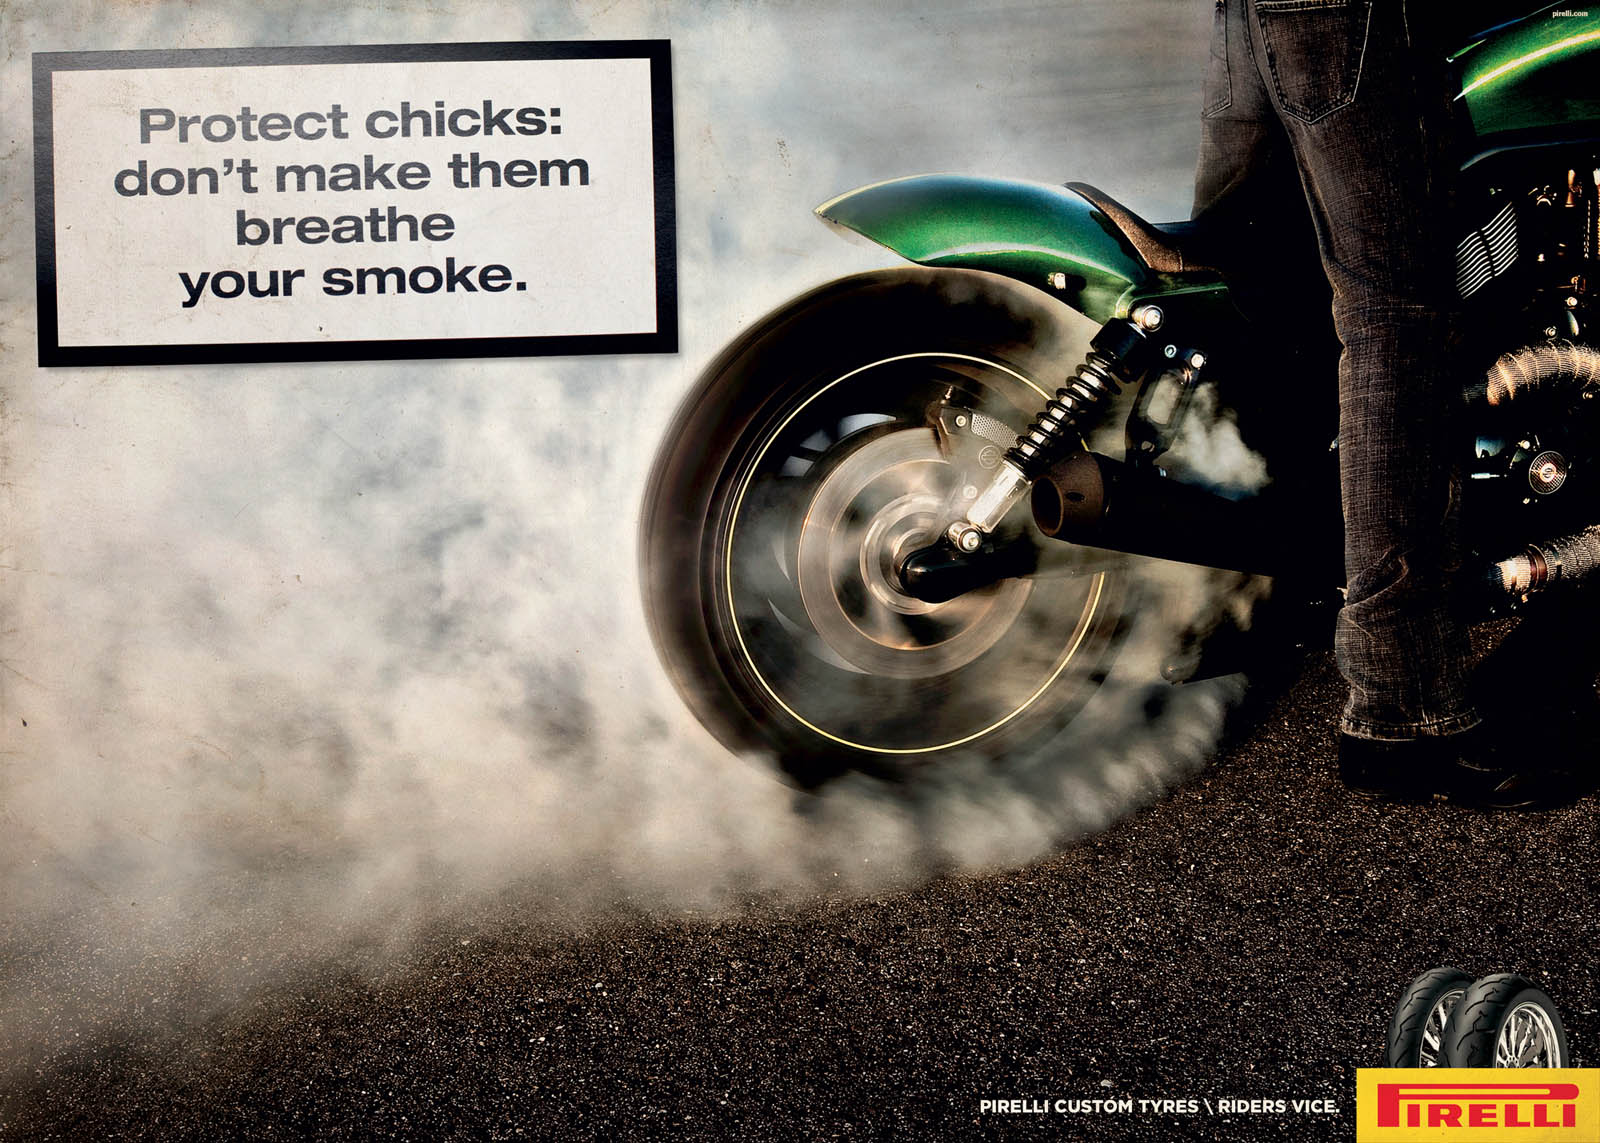 http://4.bp.blogspot.com/-sxzusFsne_o/Thbe14QY1gI/AAAAAAAAB8o/9vbdq1iUy4s/s1600/pirelli-smoke2.jpg